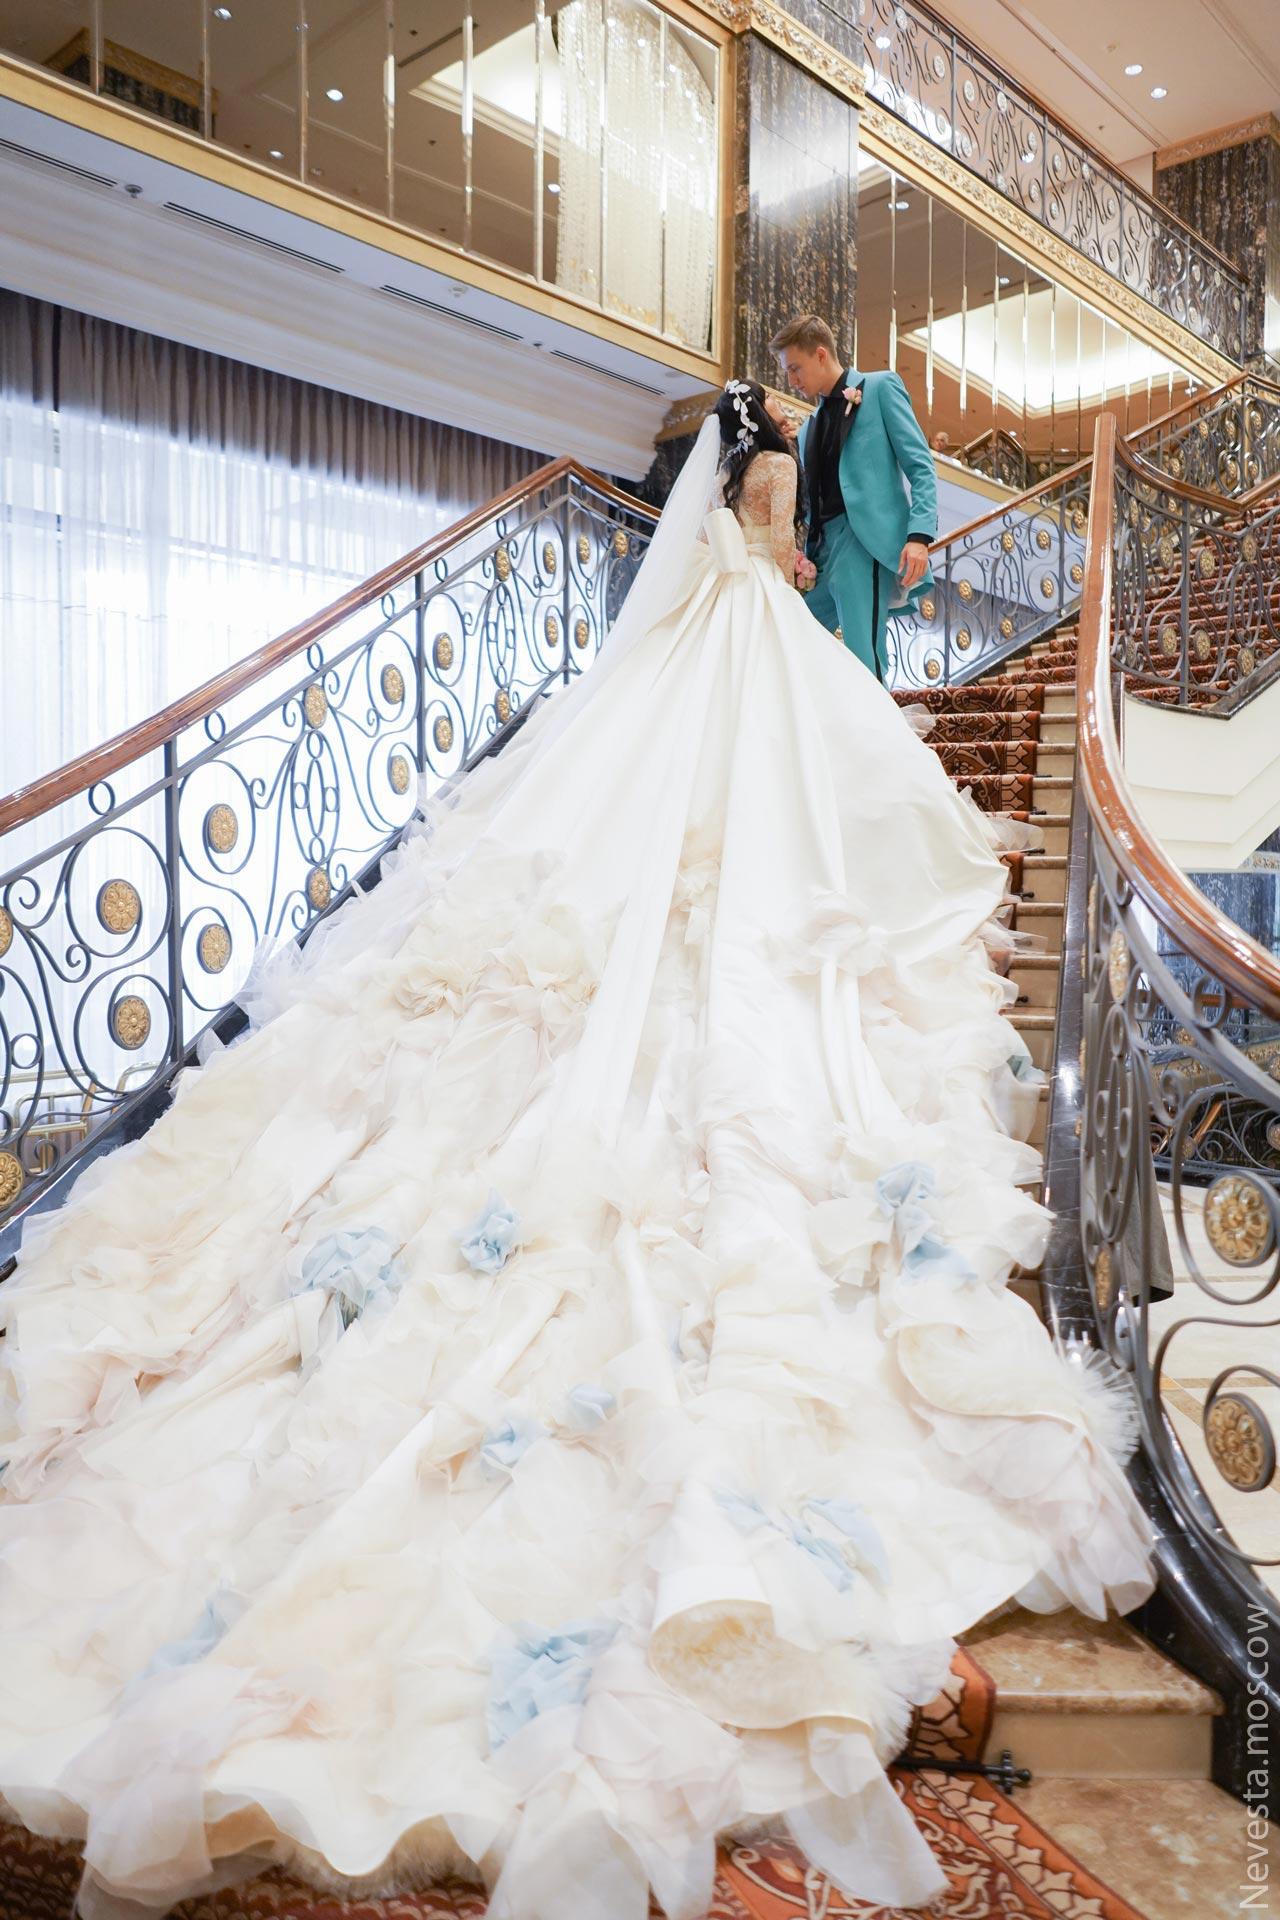 Свадьба Нелли Ермолаевой и Кирилла Андреева фото 15